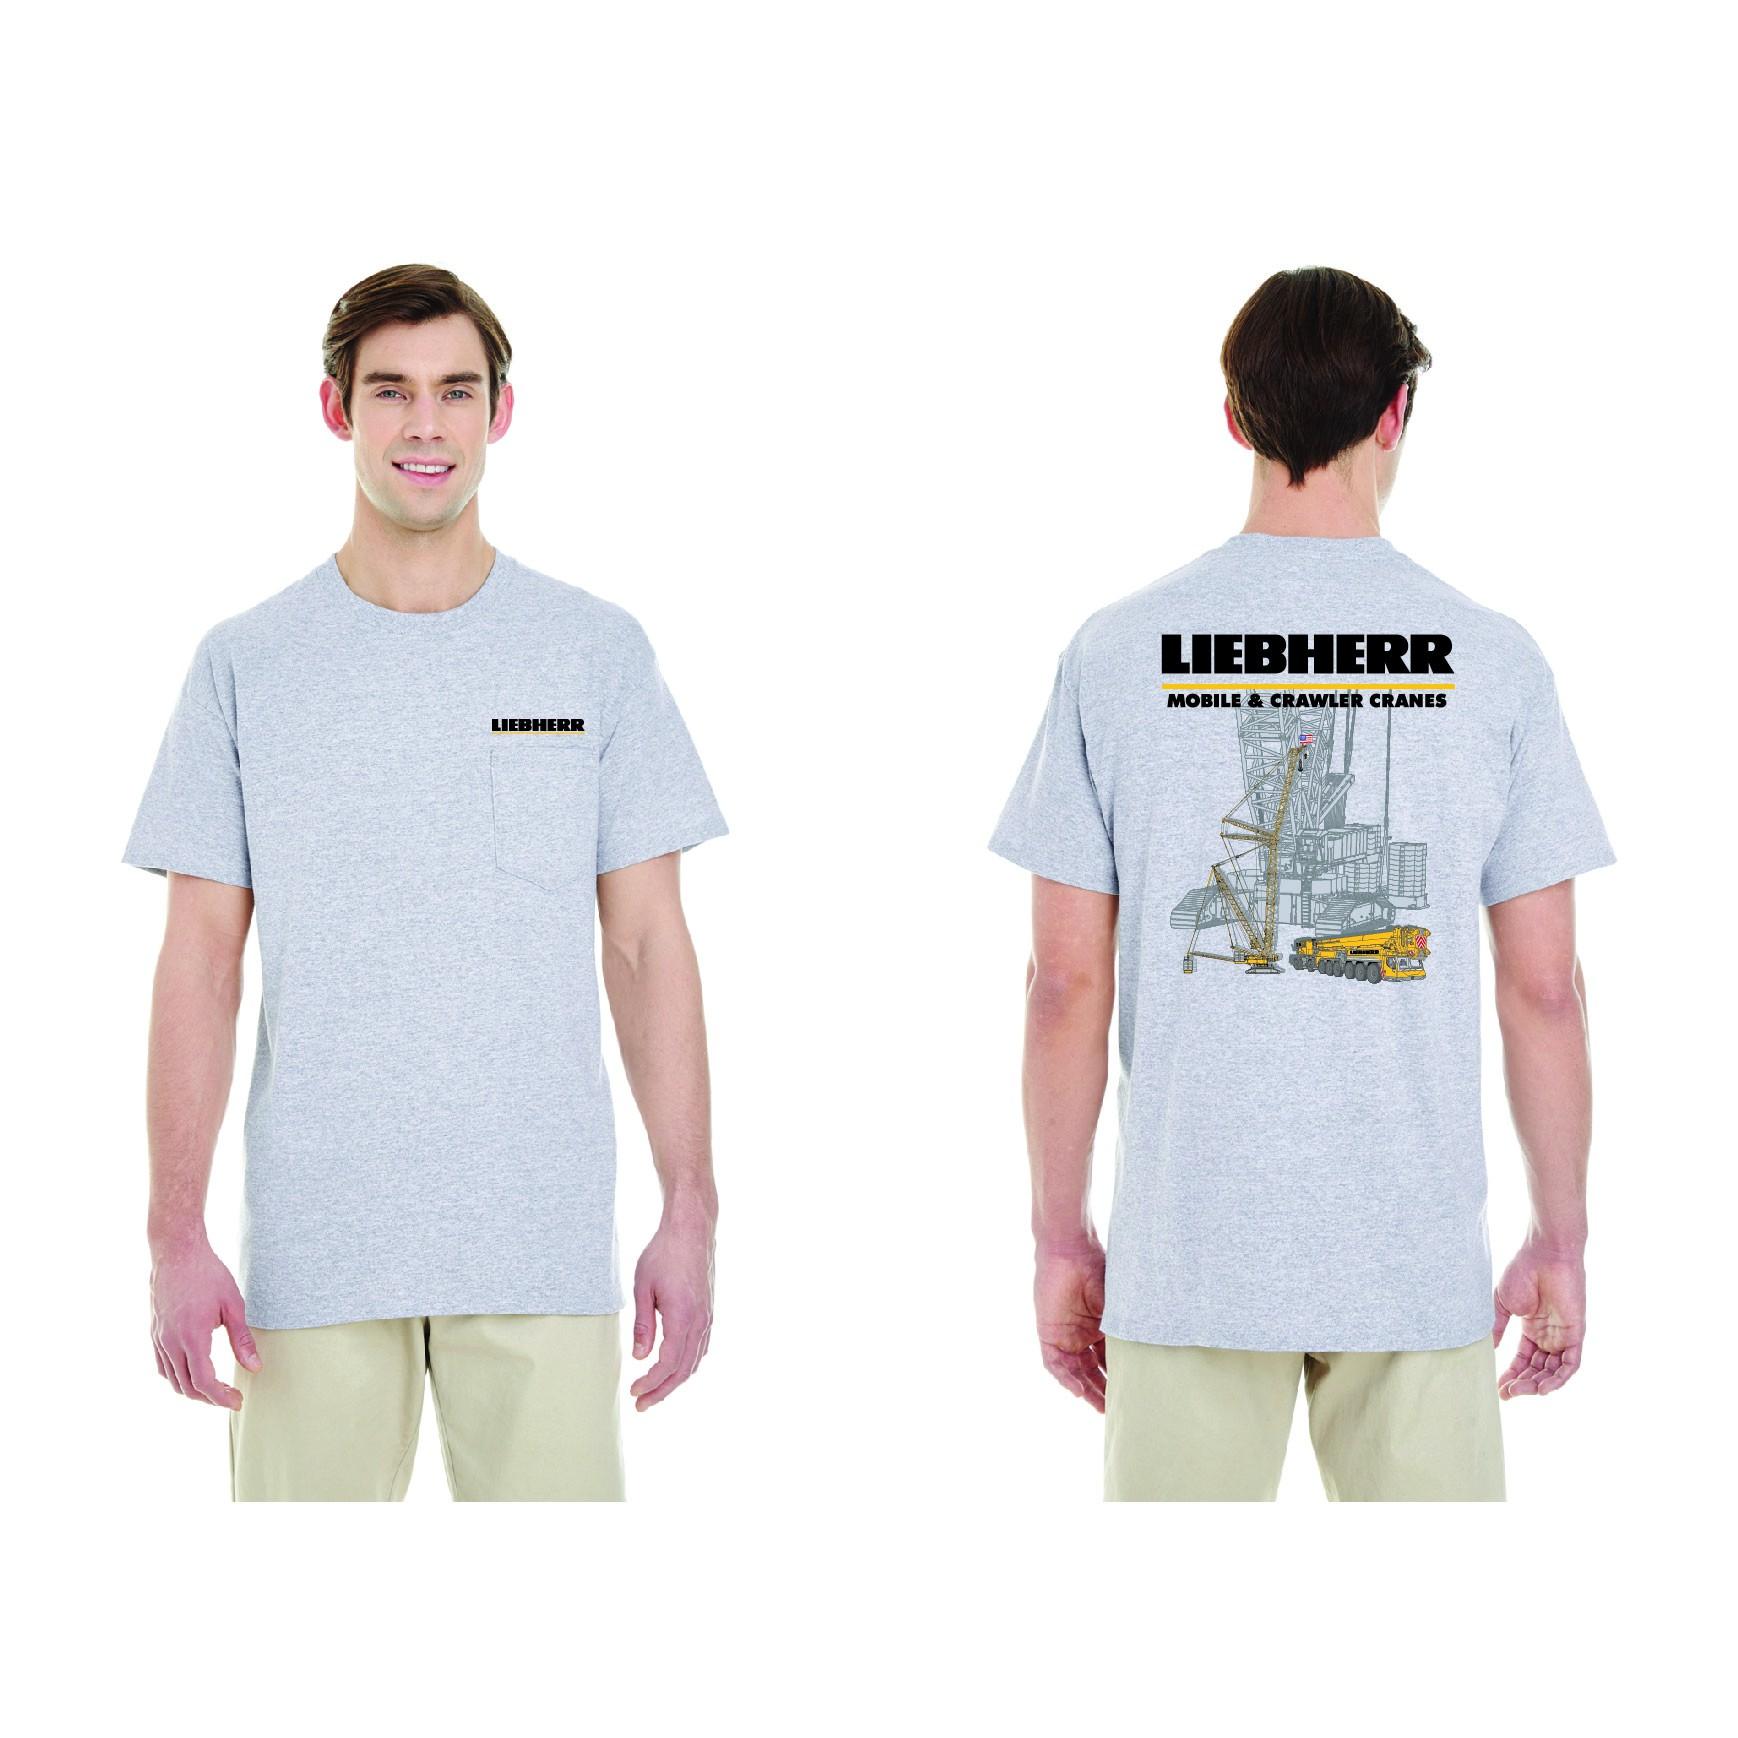 Liebherr Mobile & Crawler Cranes T-shirt